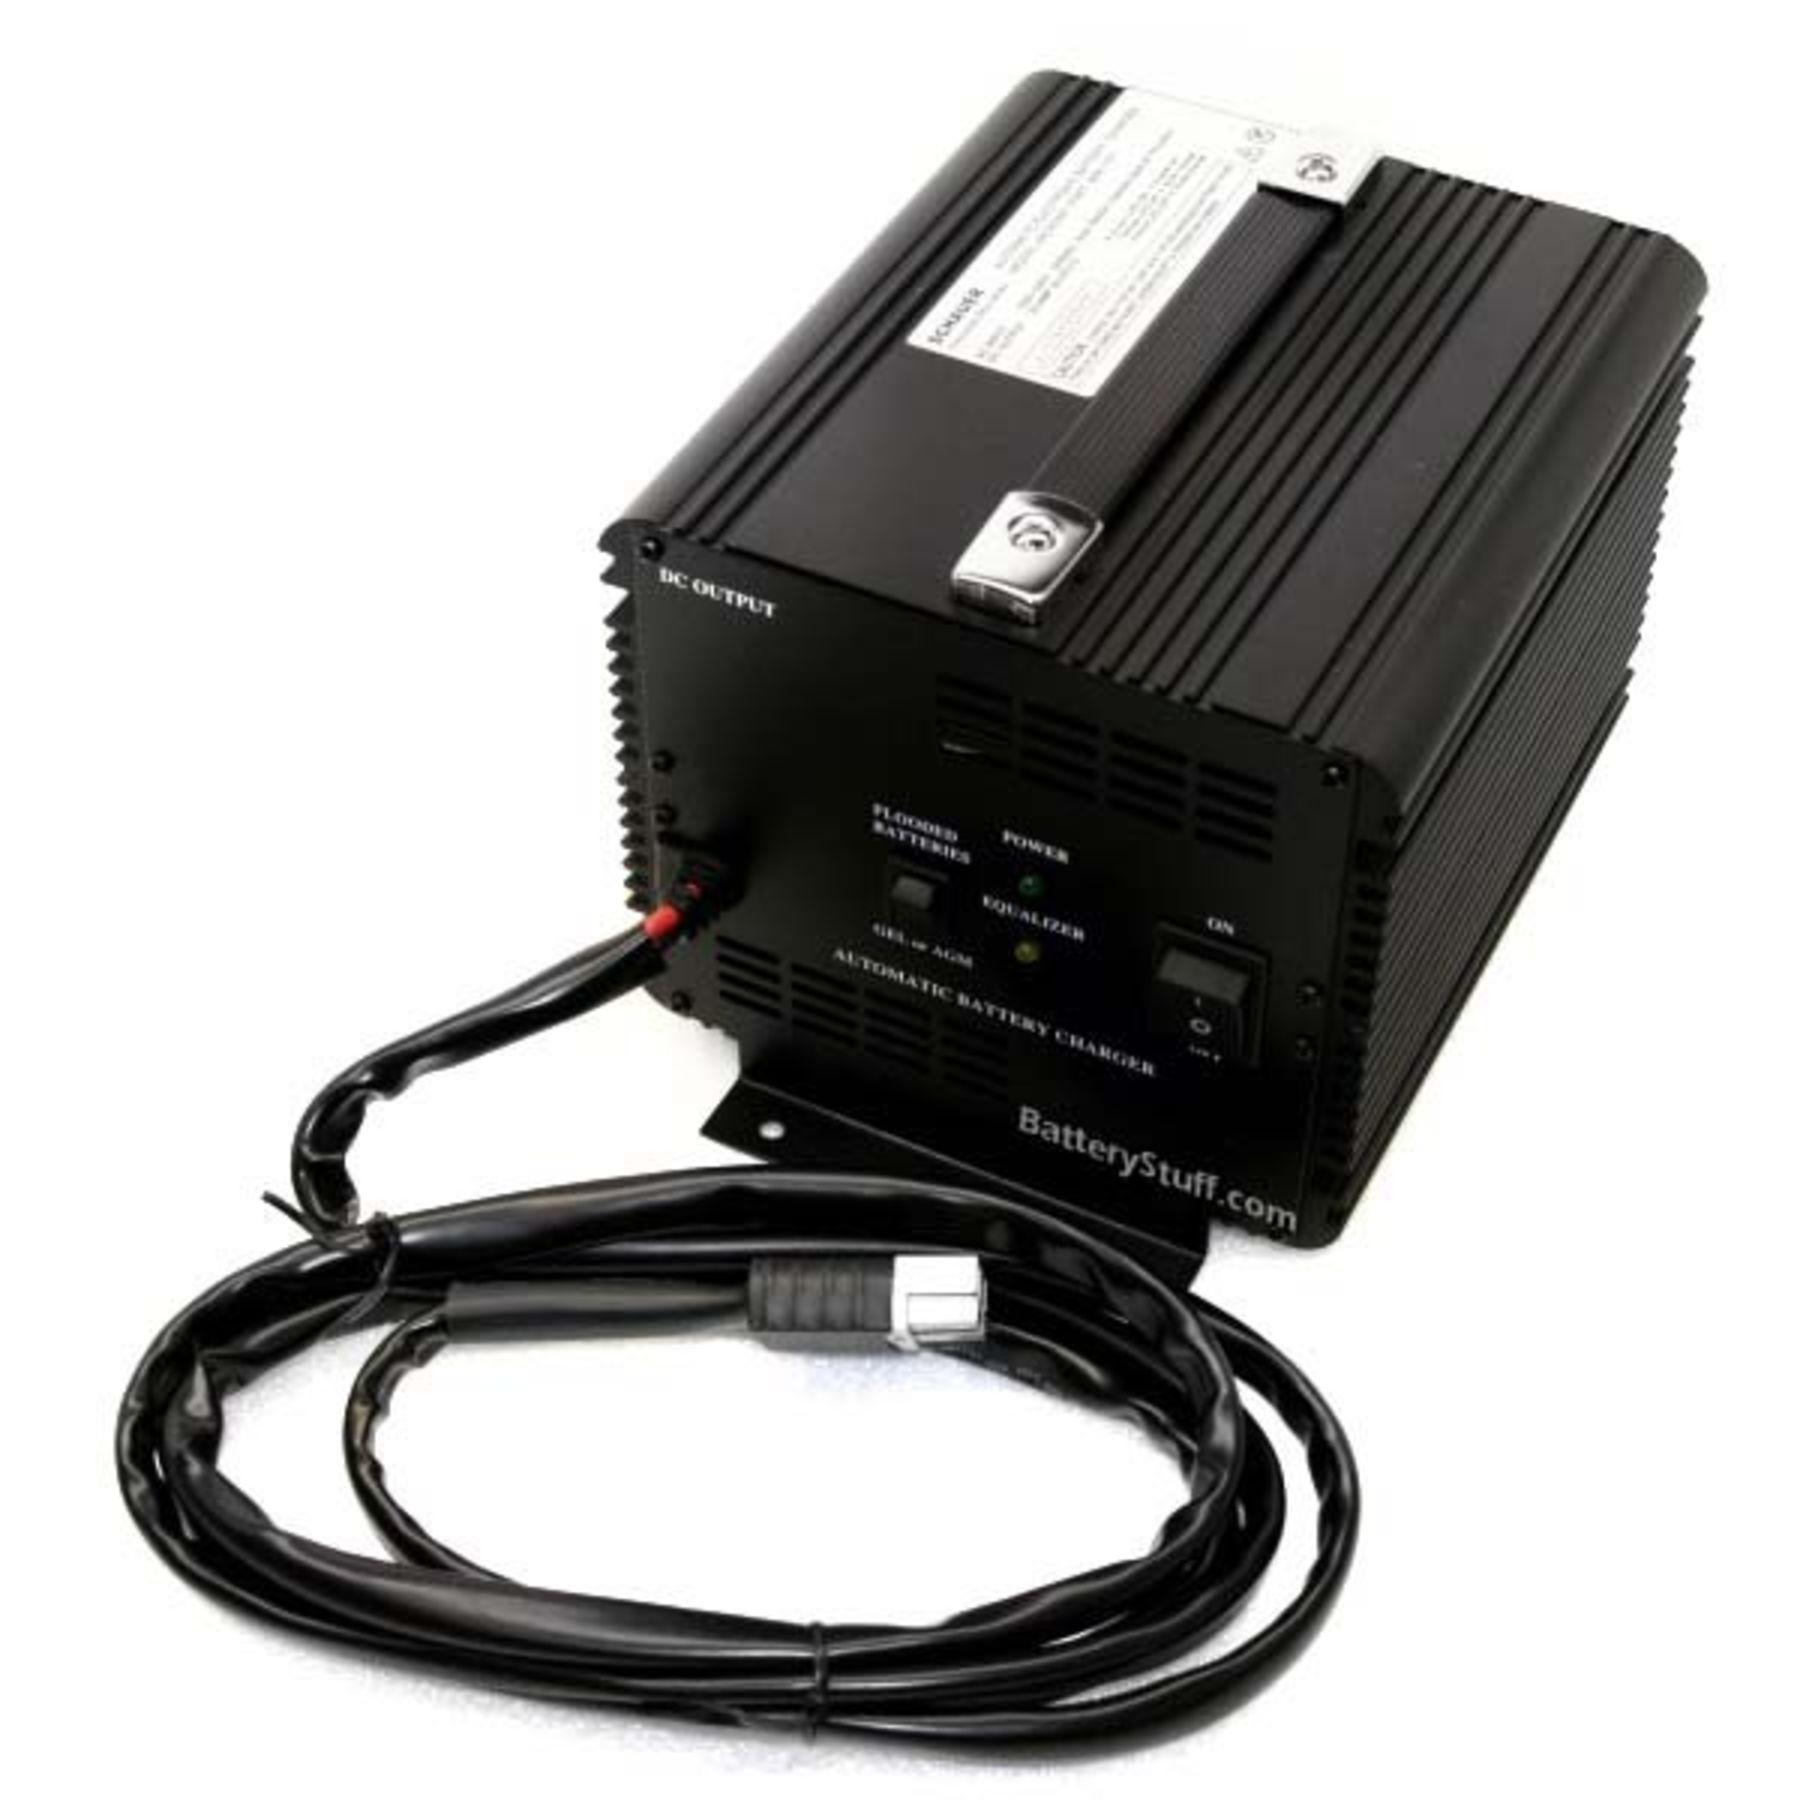 36 volt cat5e wiring diagram australia schauer 20 amp